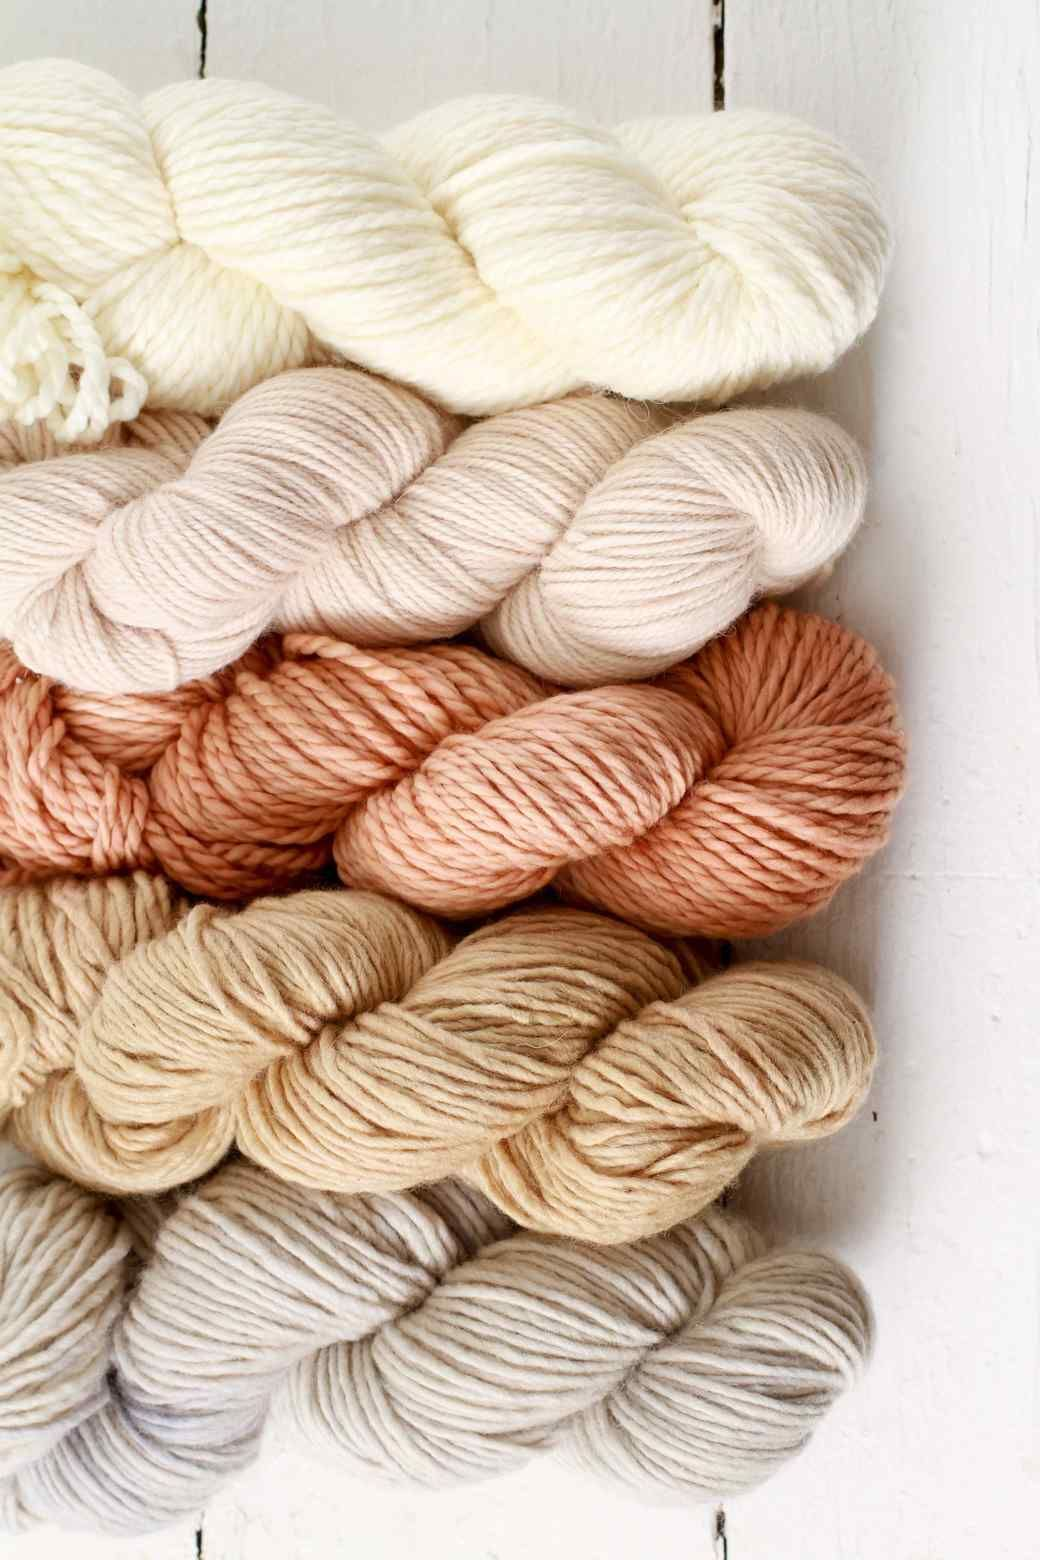 How To Dye Yarn Naturally Dyed Yarn Diy Natural Dye Fabric Yarn Dyeing